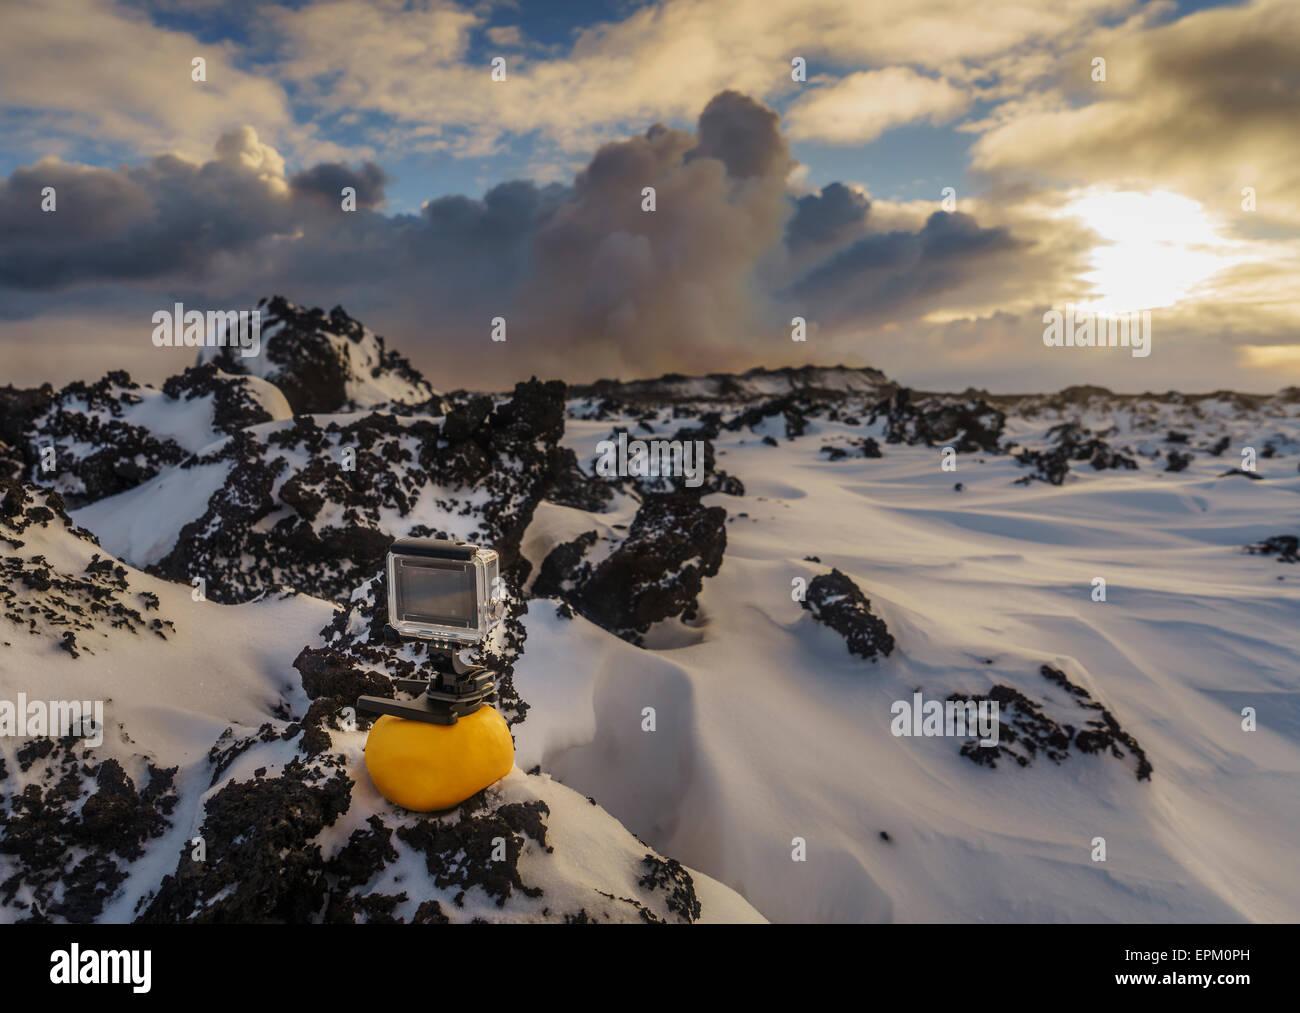 GoPro camera on lava rock, Holuhraun Eruption in the background, Iceland - Stock Image